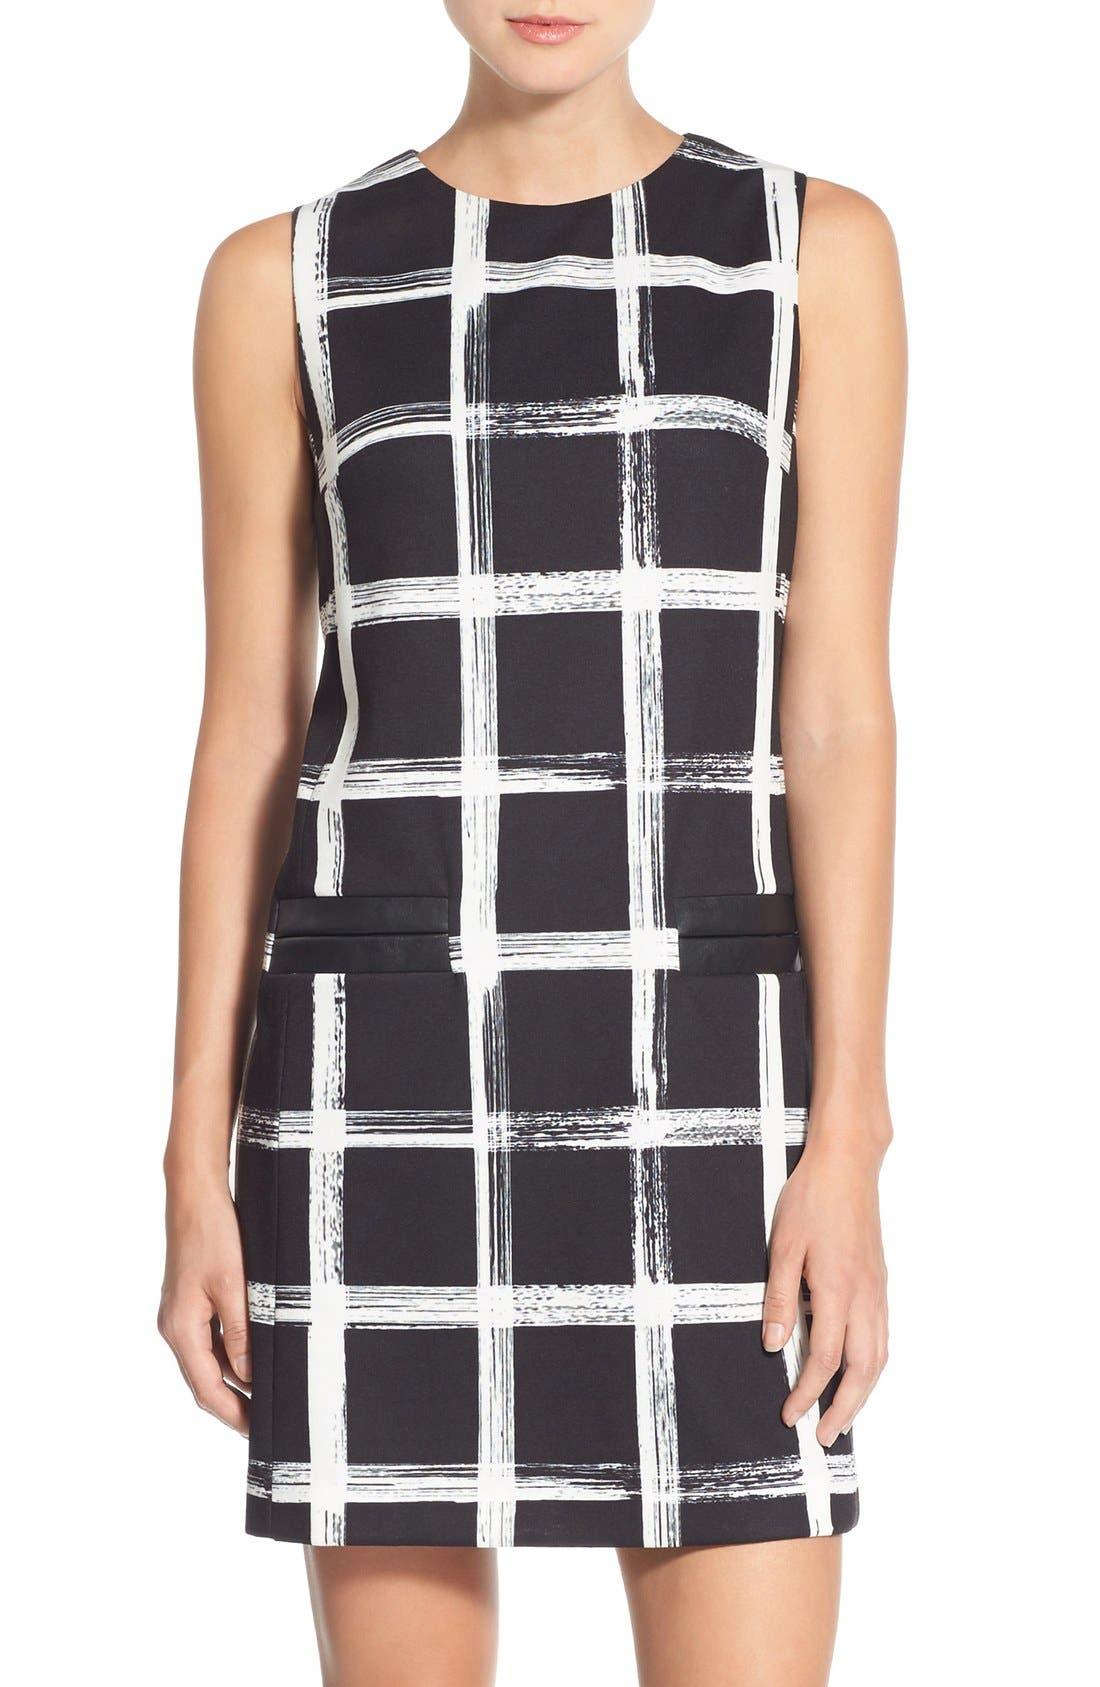 Alternate Image 1 Selected - Eliza J Windowpane Print Ponte Shift Dress (Regular & Petite)